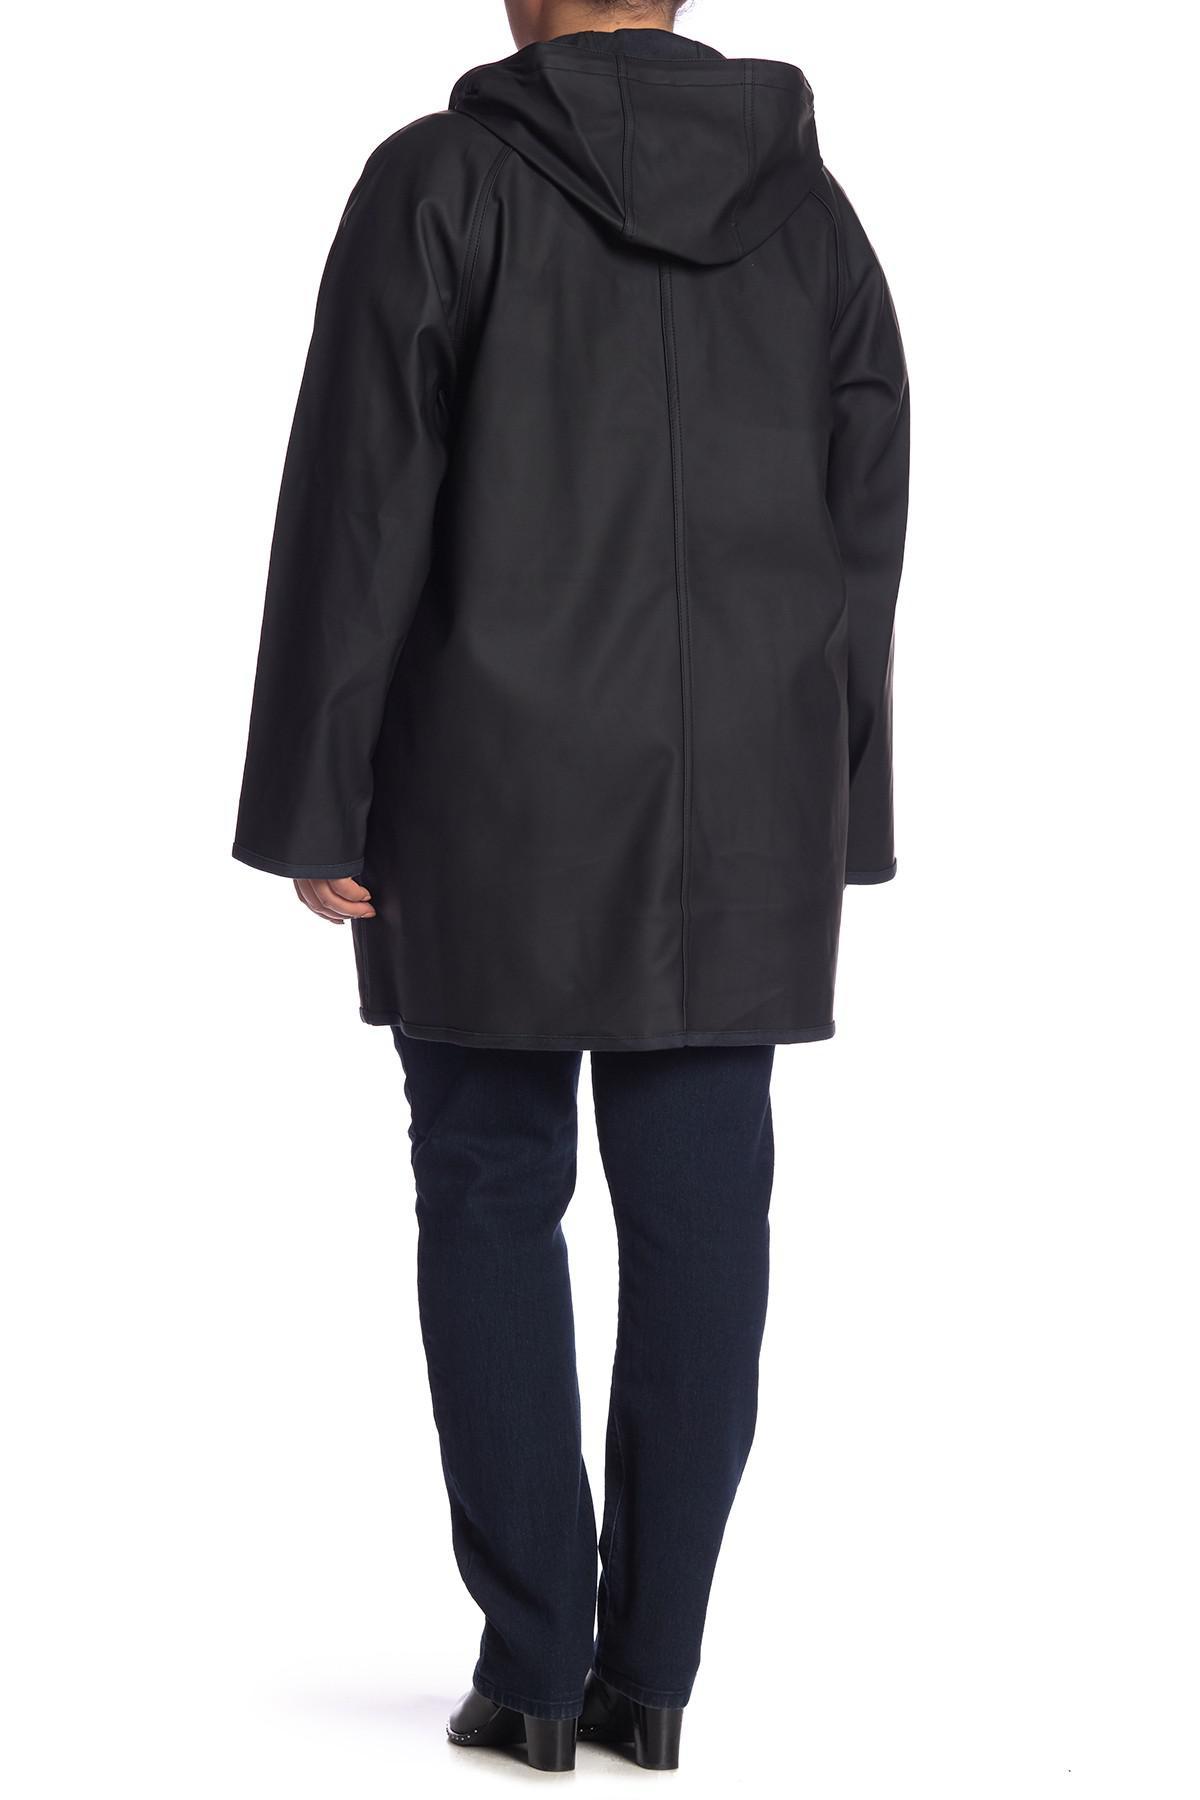 66df241459c Levi s - Black Waterproof Raincoat (plus Size) - Lyst. View fullscreen